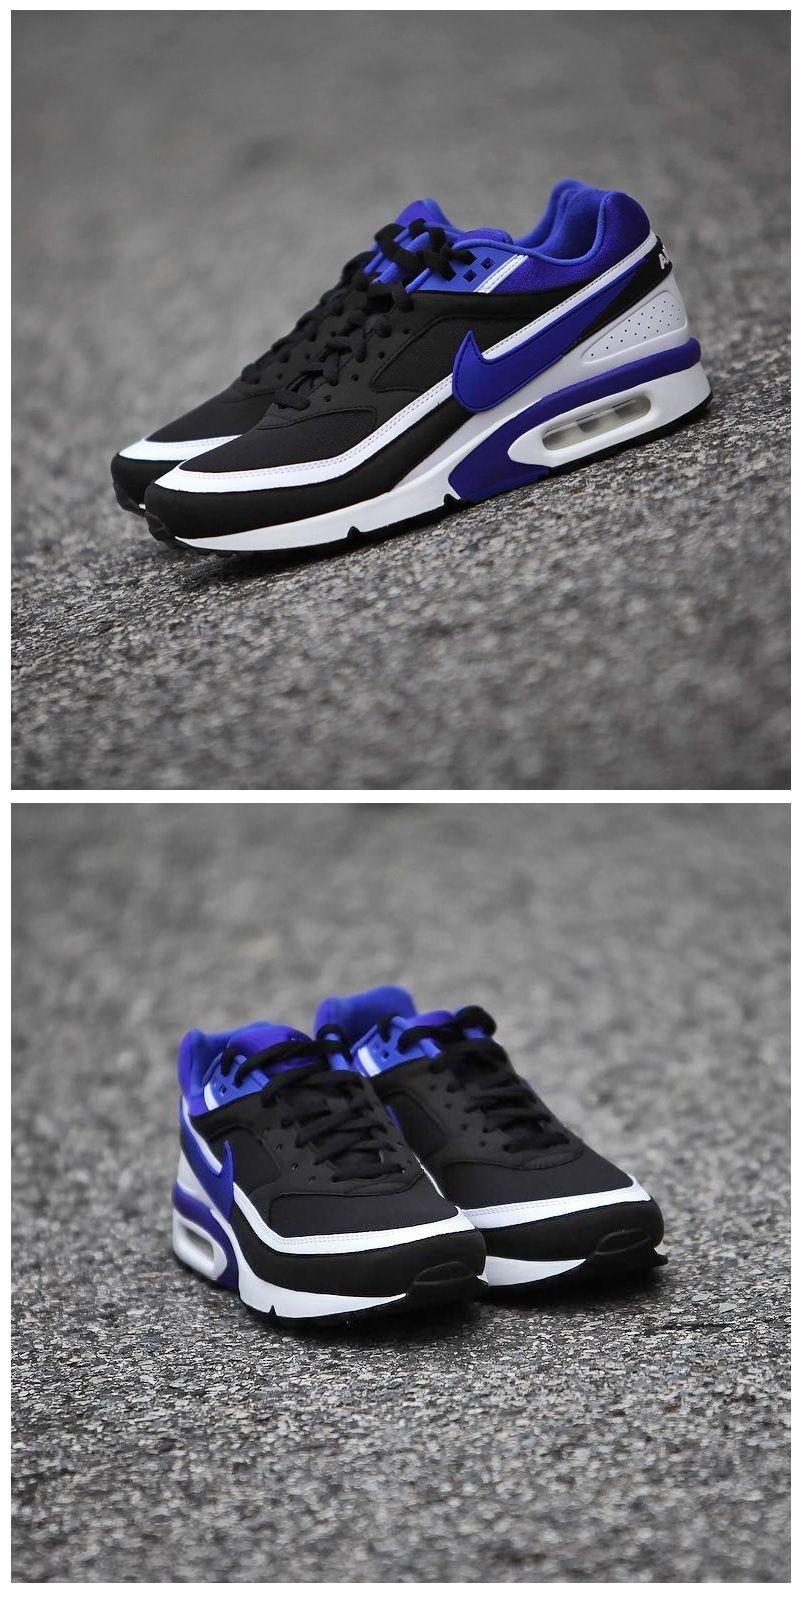 Nike Air Classic BW | Sneakers: Nike Air Classic BW | Air